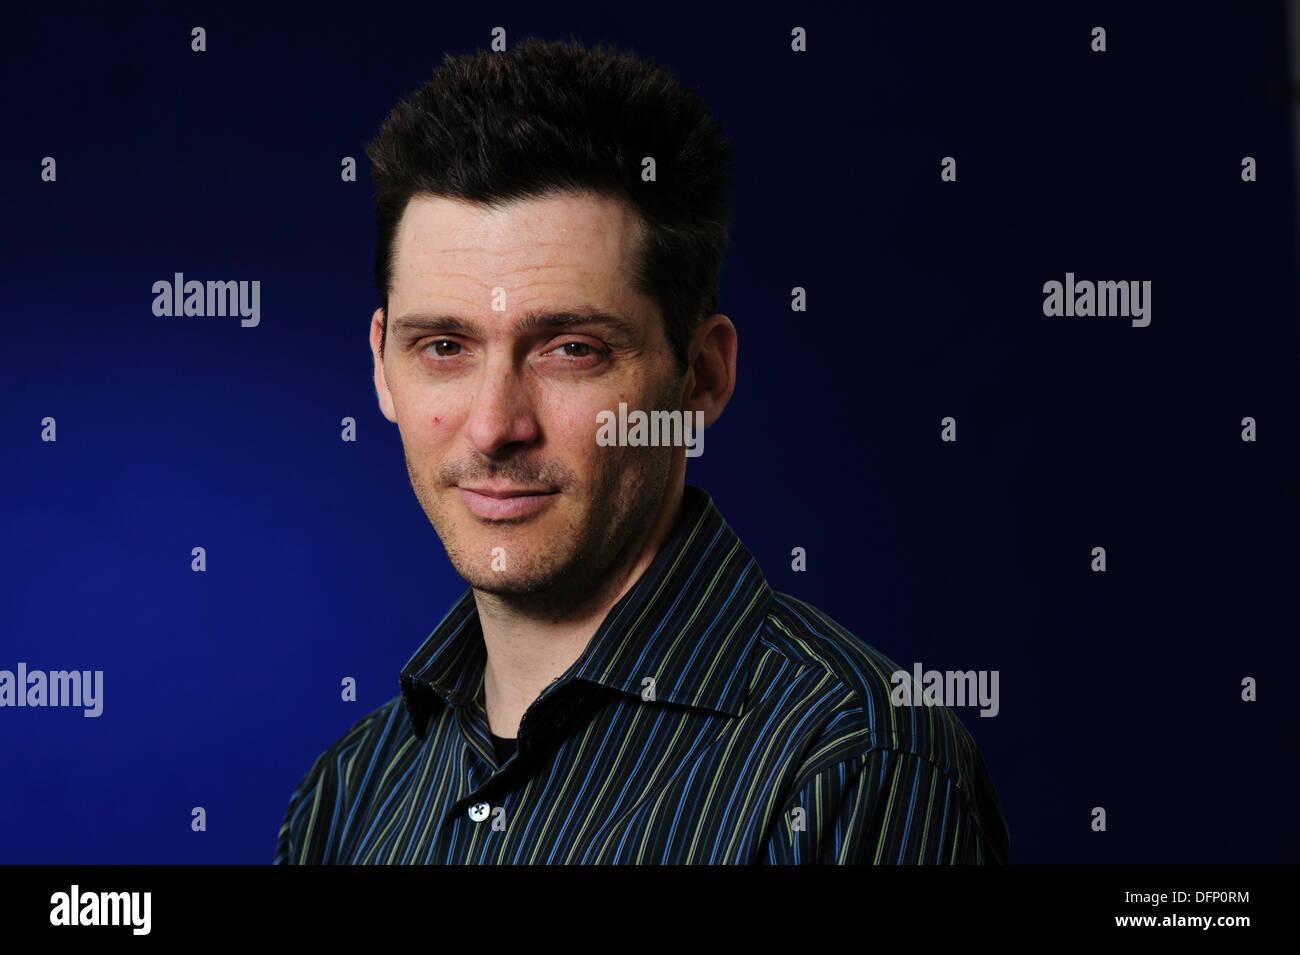 Matt Kaplan, Science journalist, author and adventurer, attending the Edinburgh International Book Festival 2013. - Stock Image